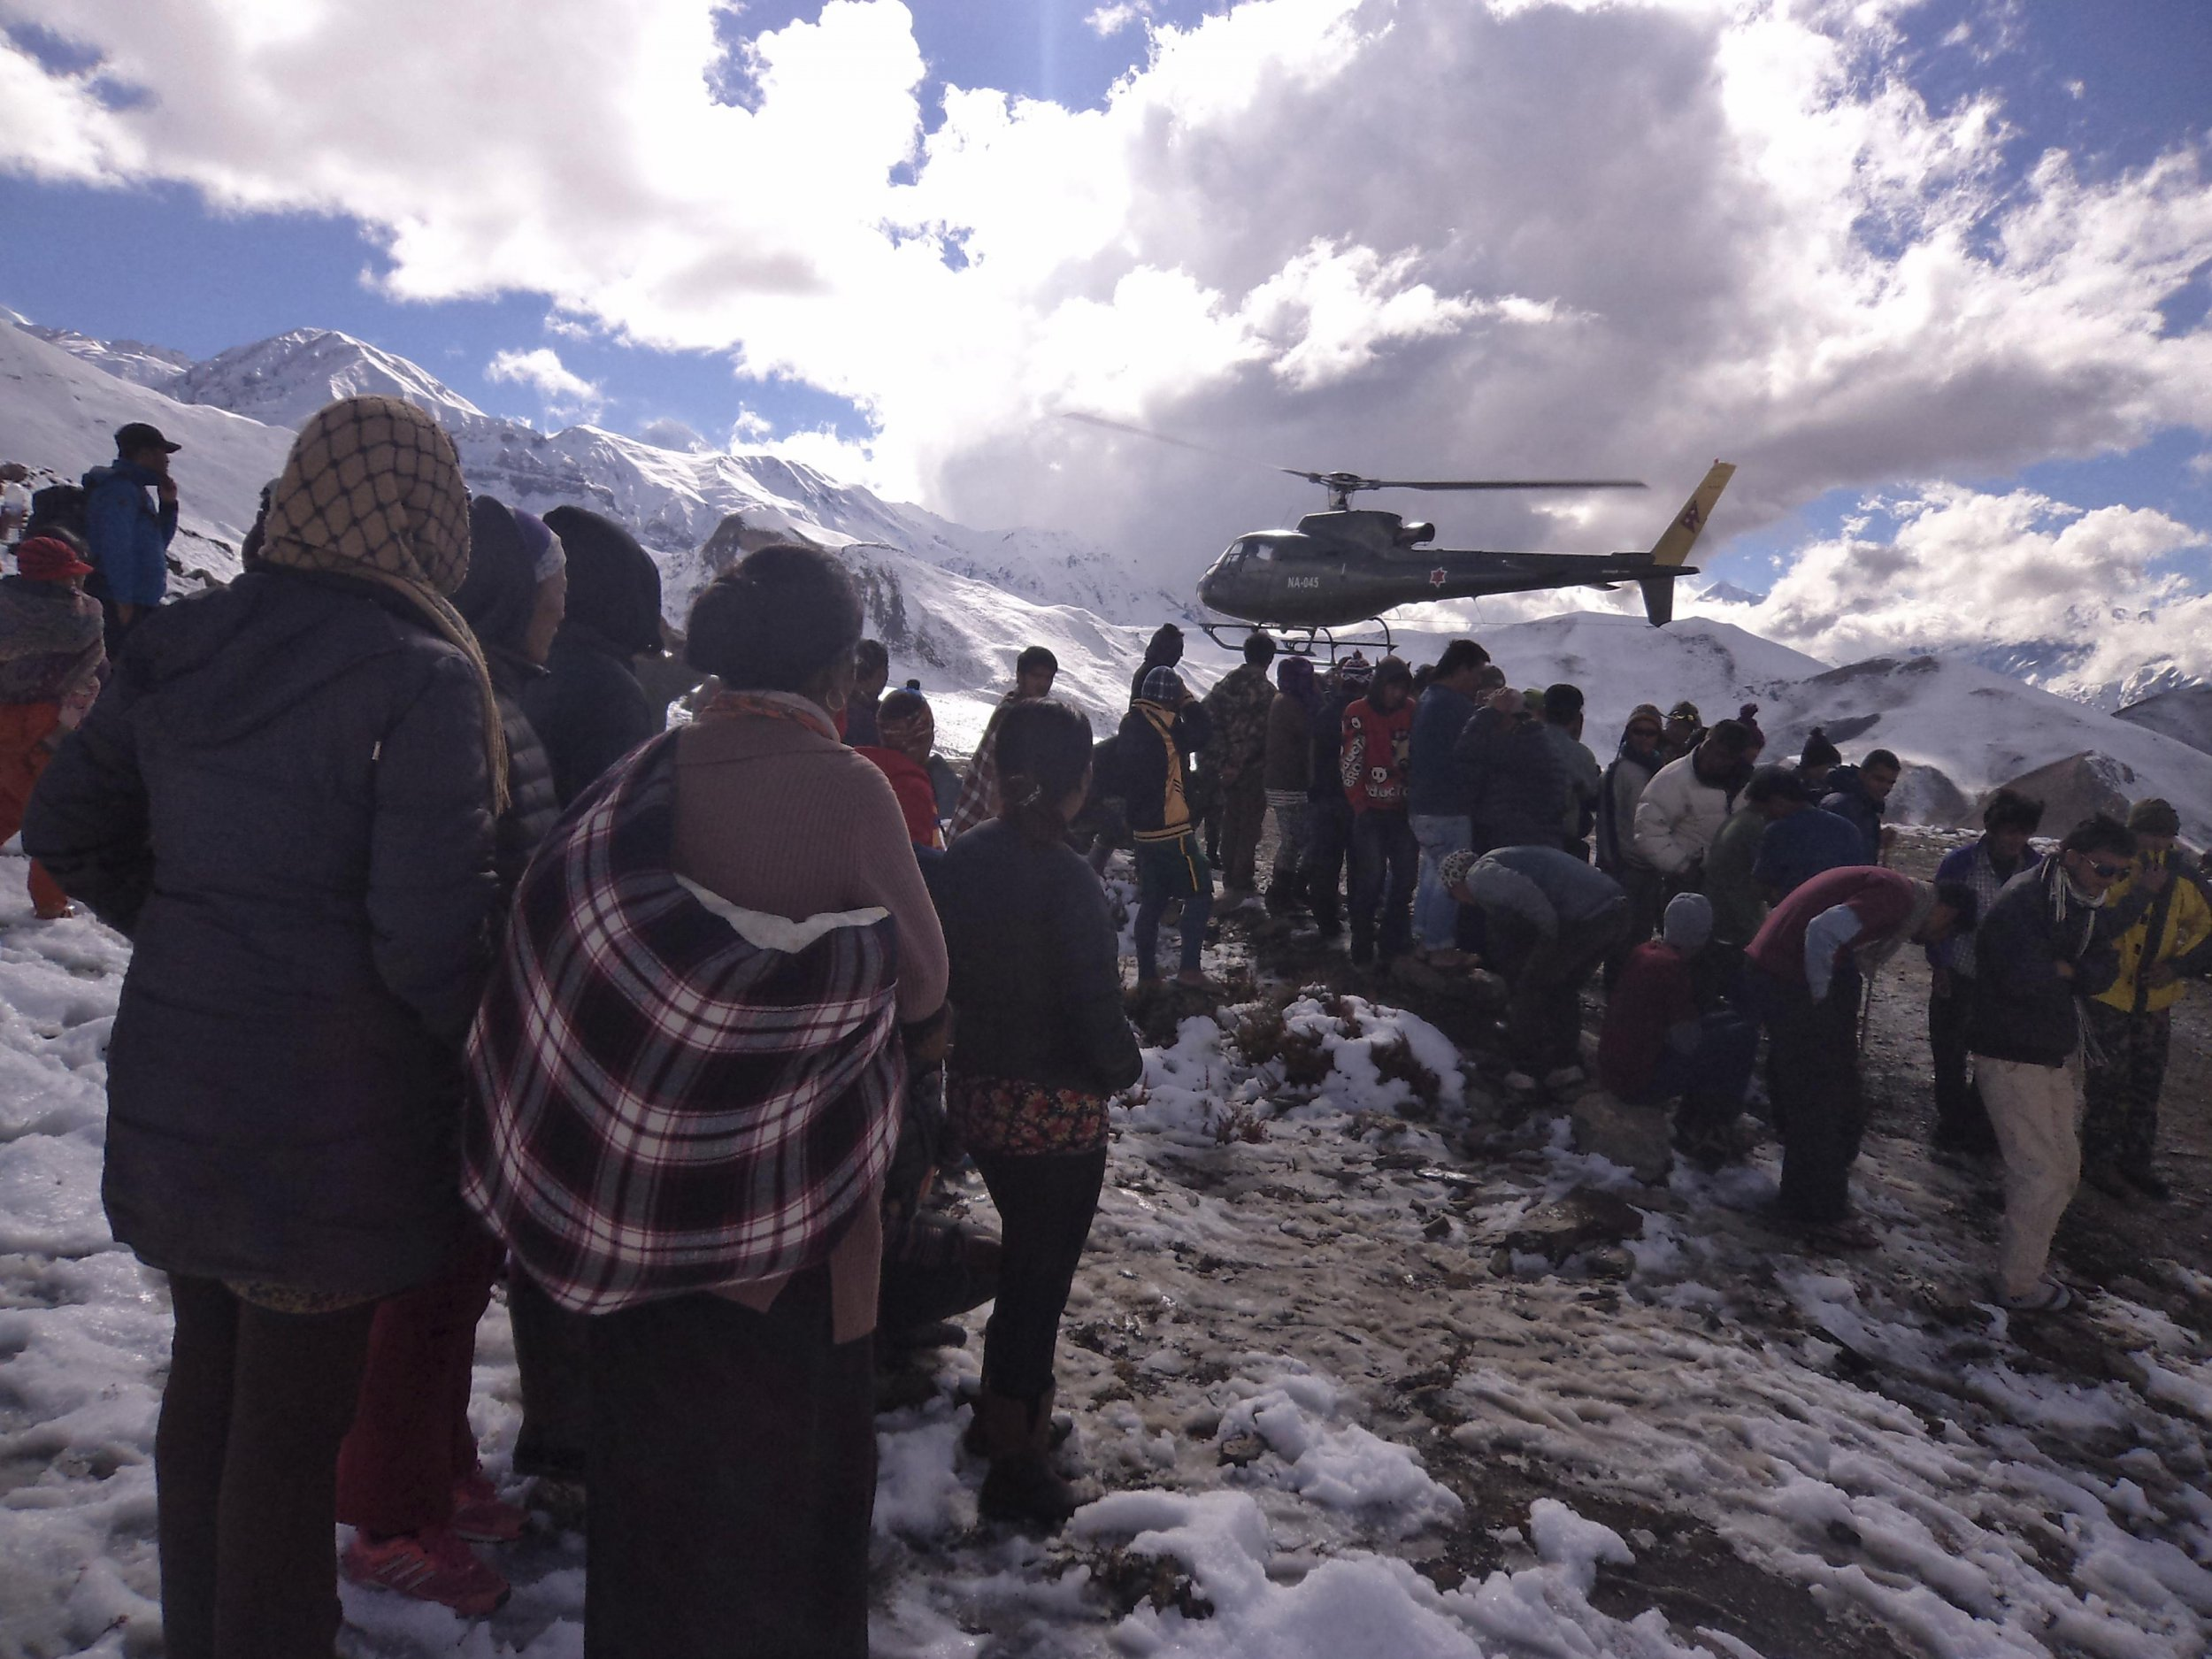 10-17-14 Nepal storm